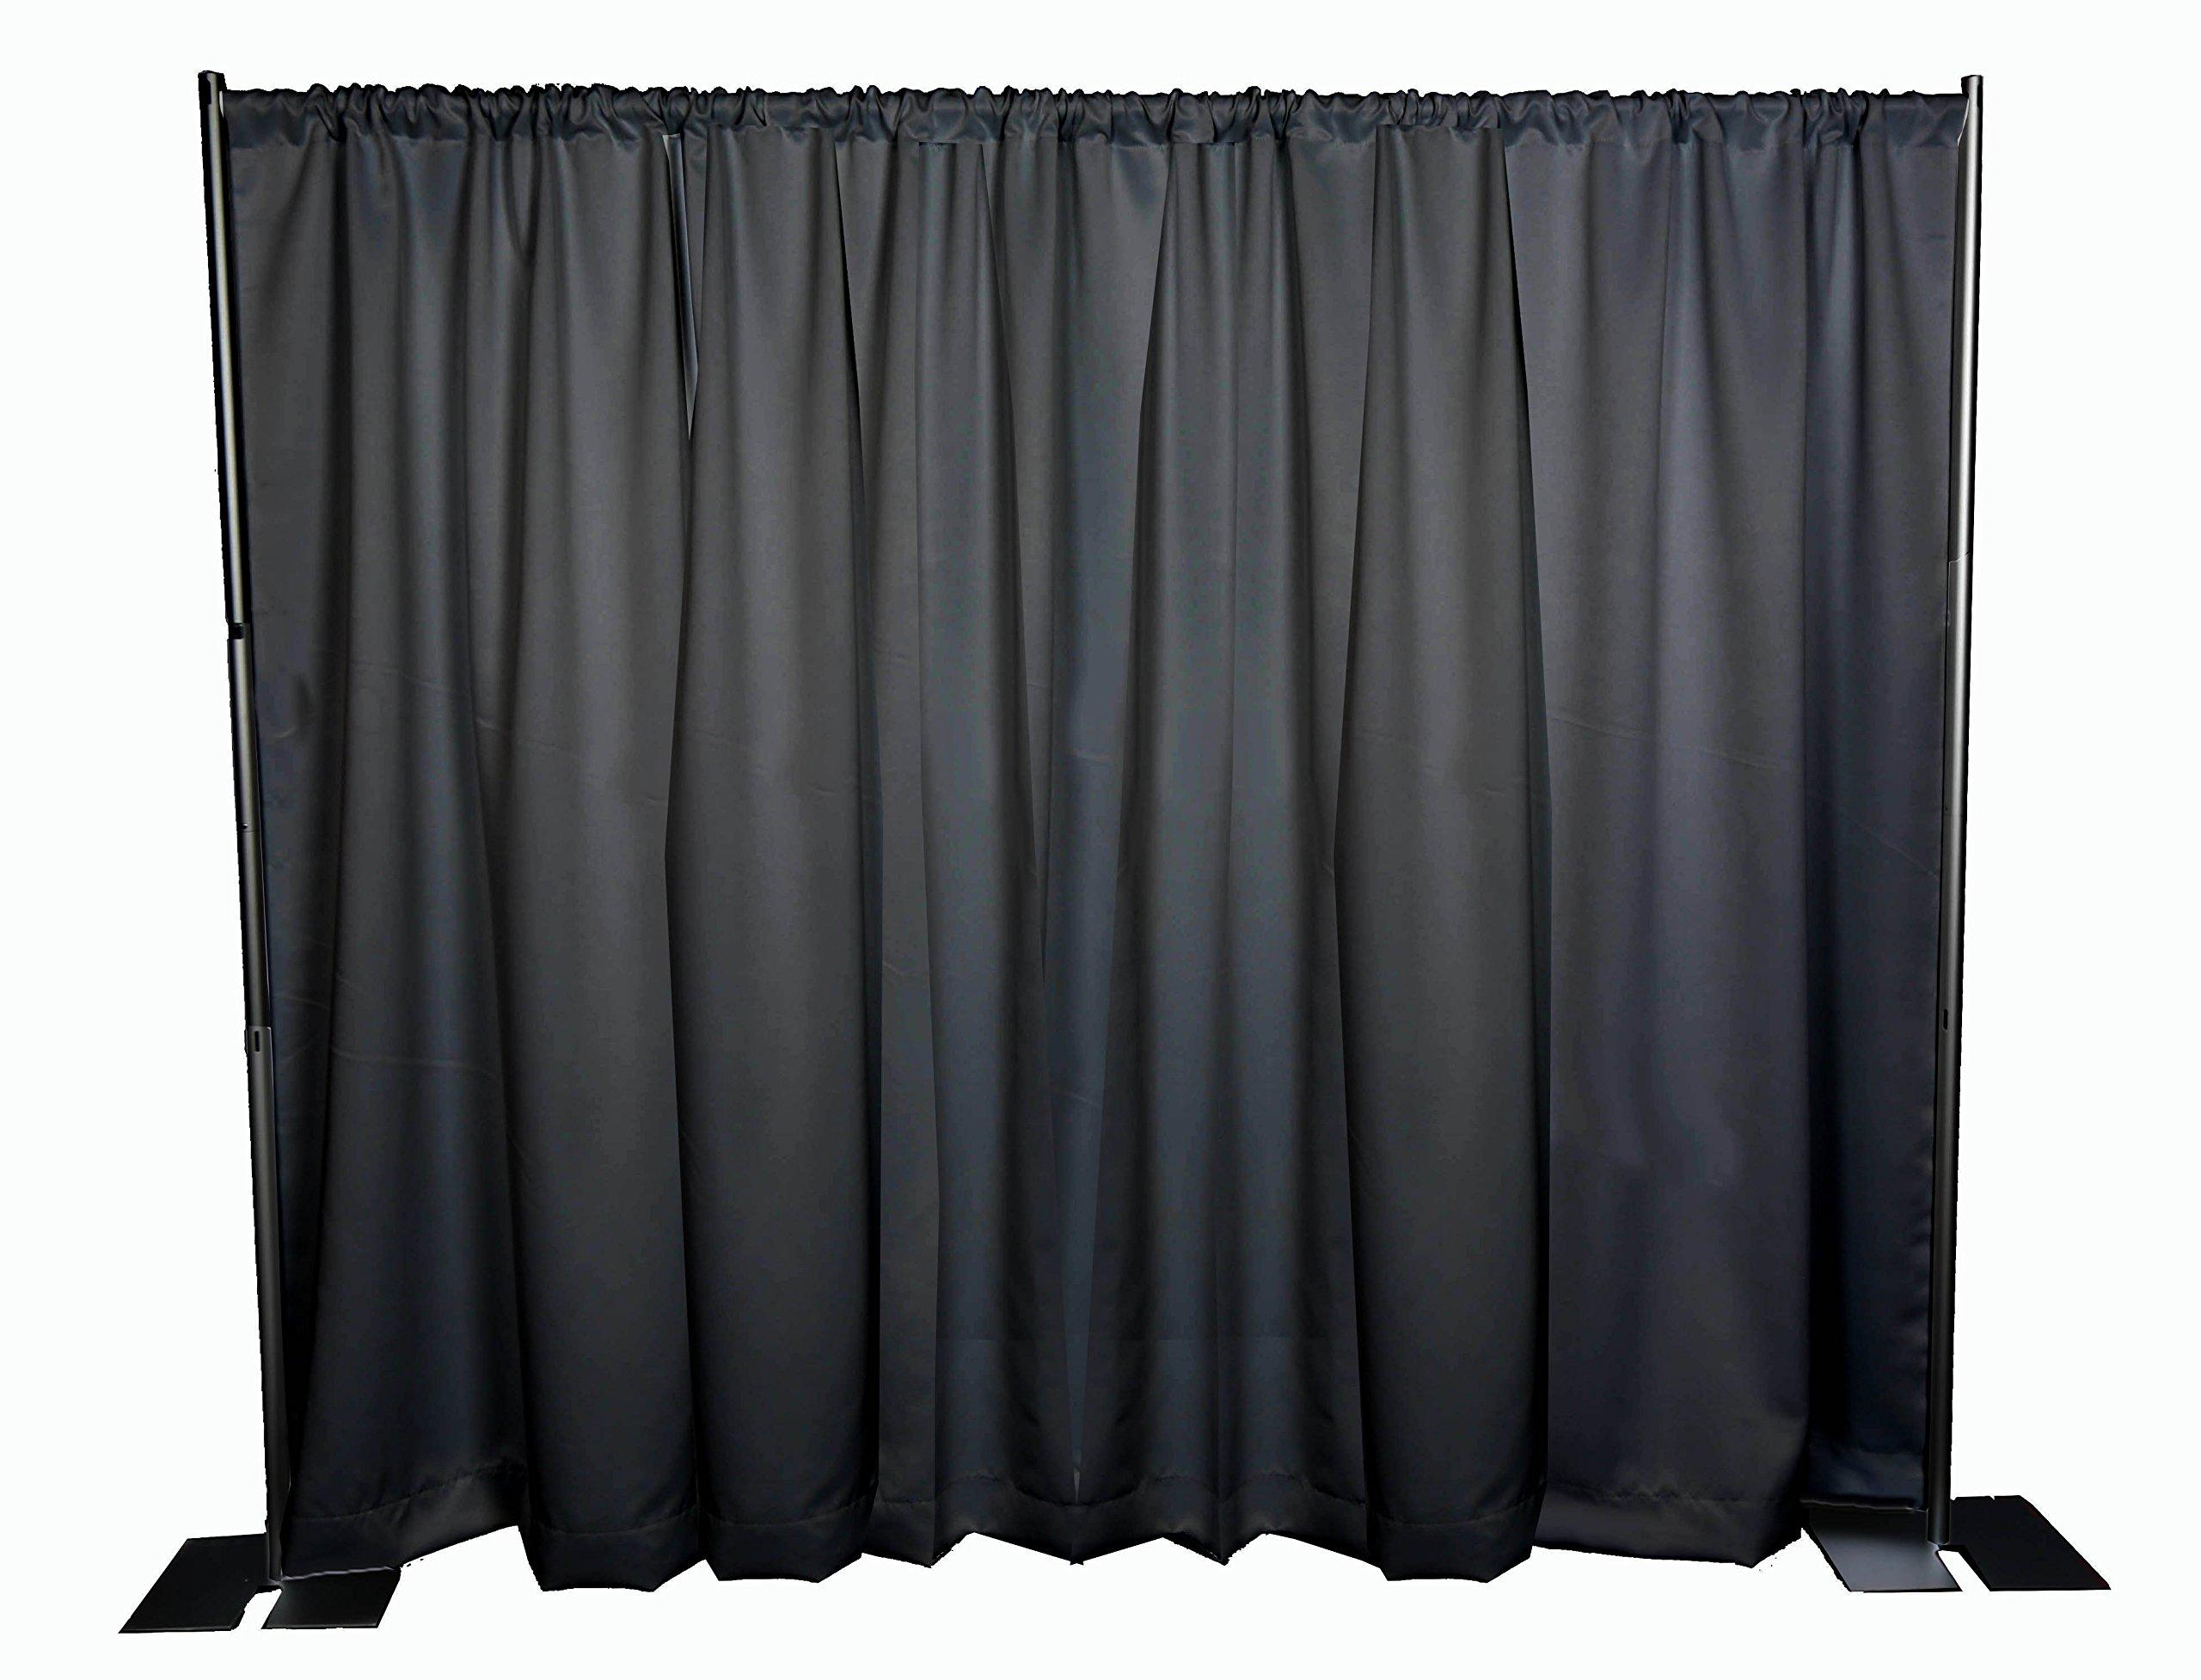 OnlineEEI Black Powdercoat Portable Pipe and Drape Backdrop Kit, Black Drapes